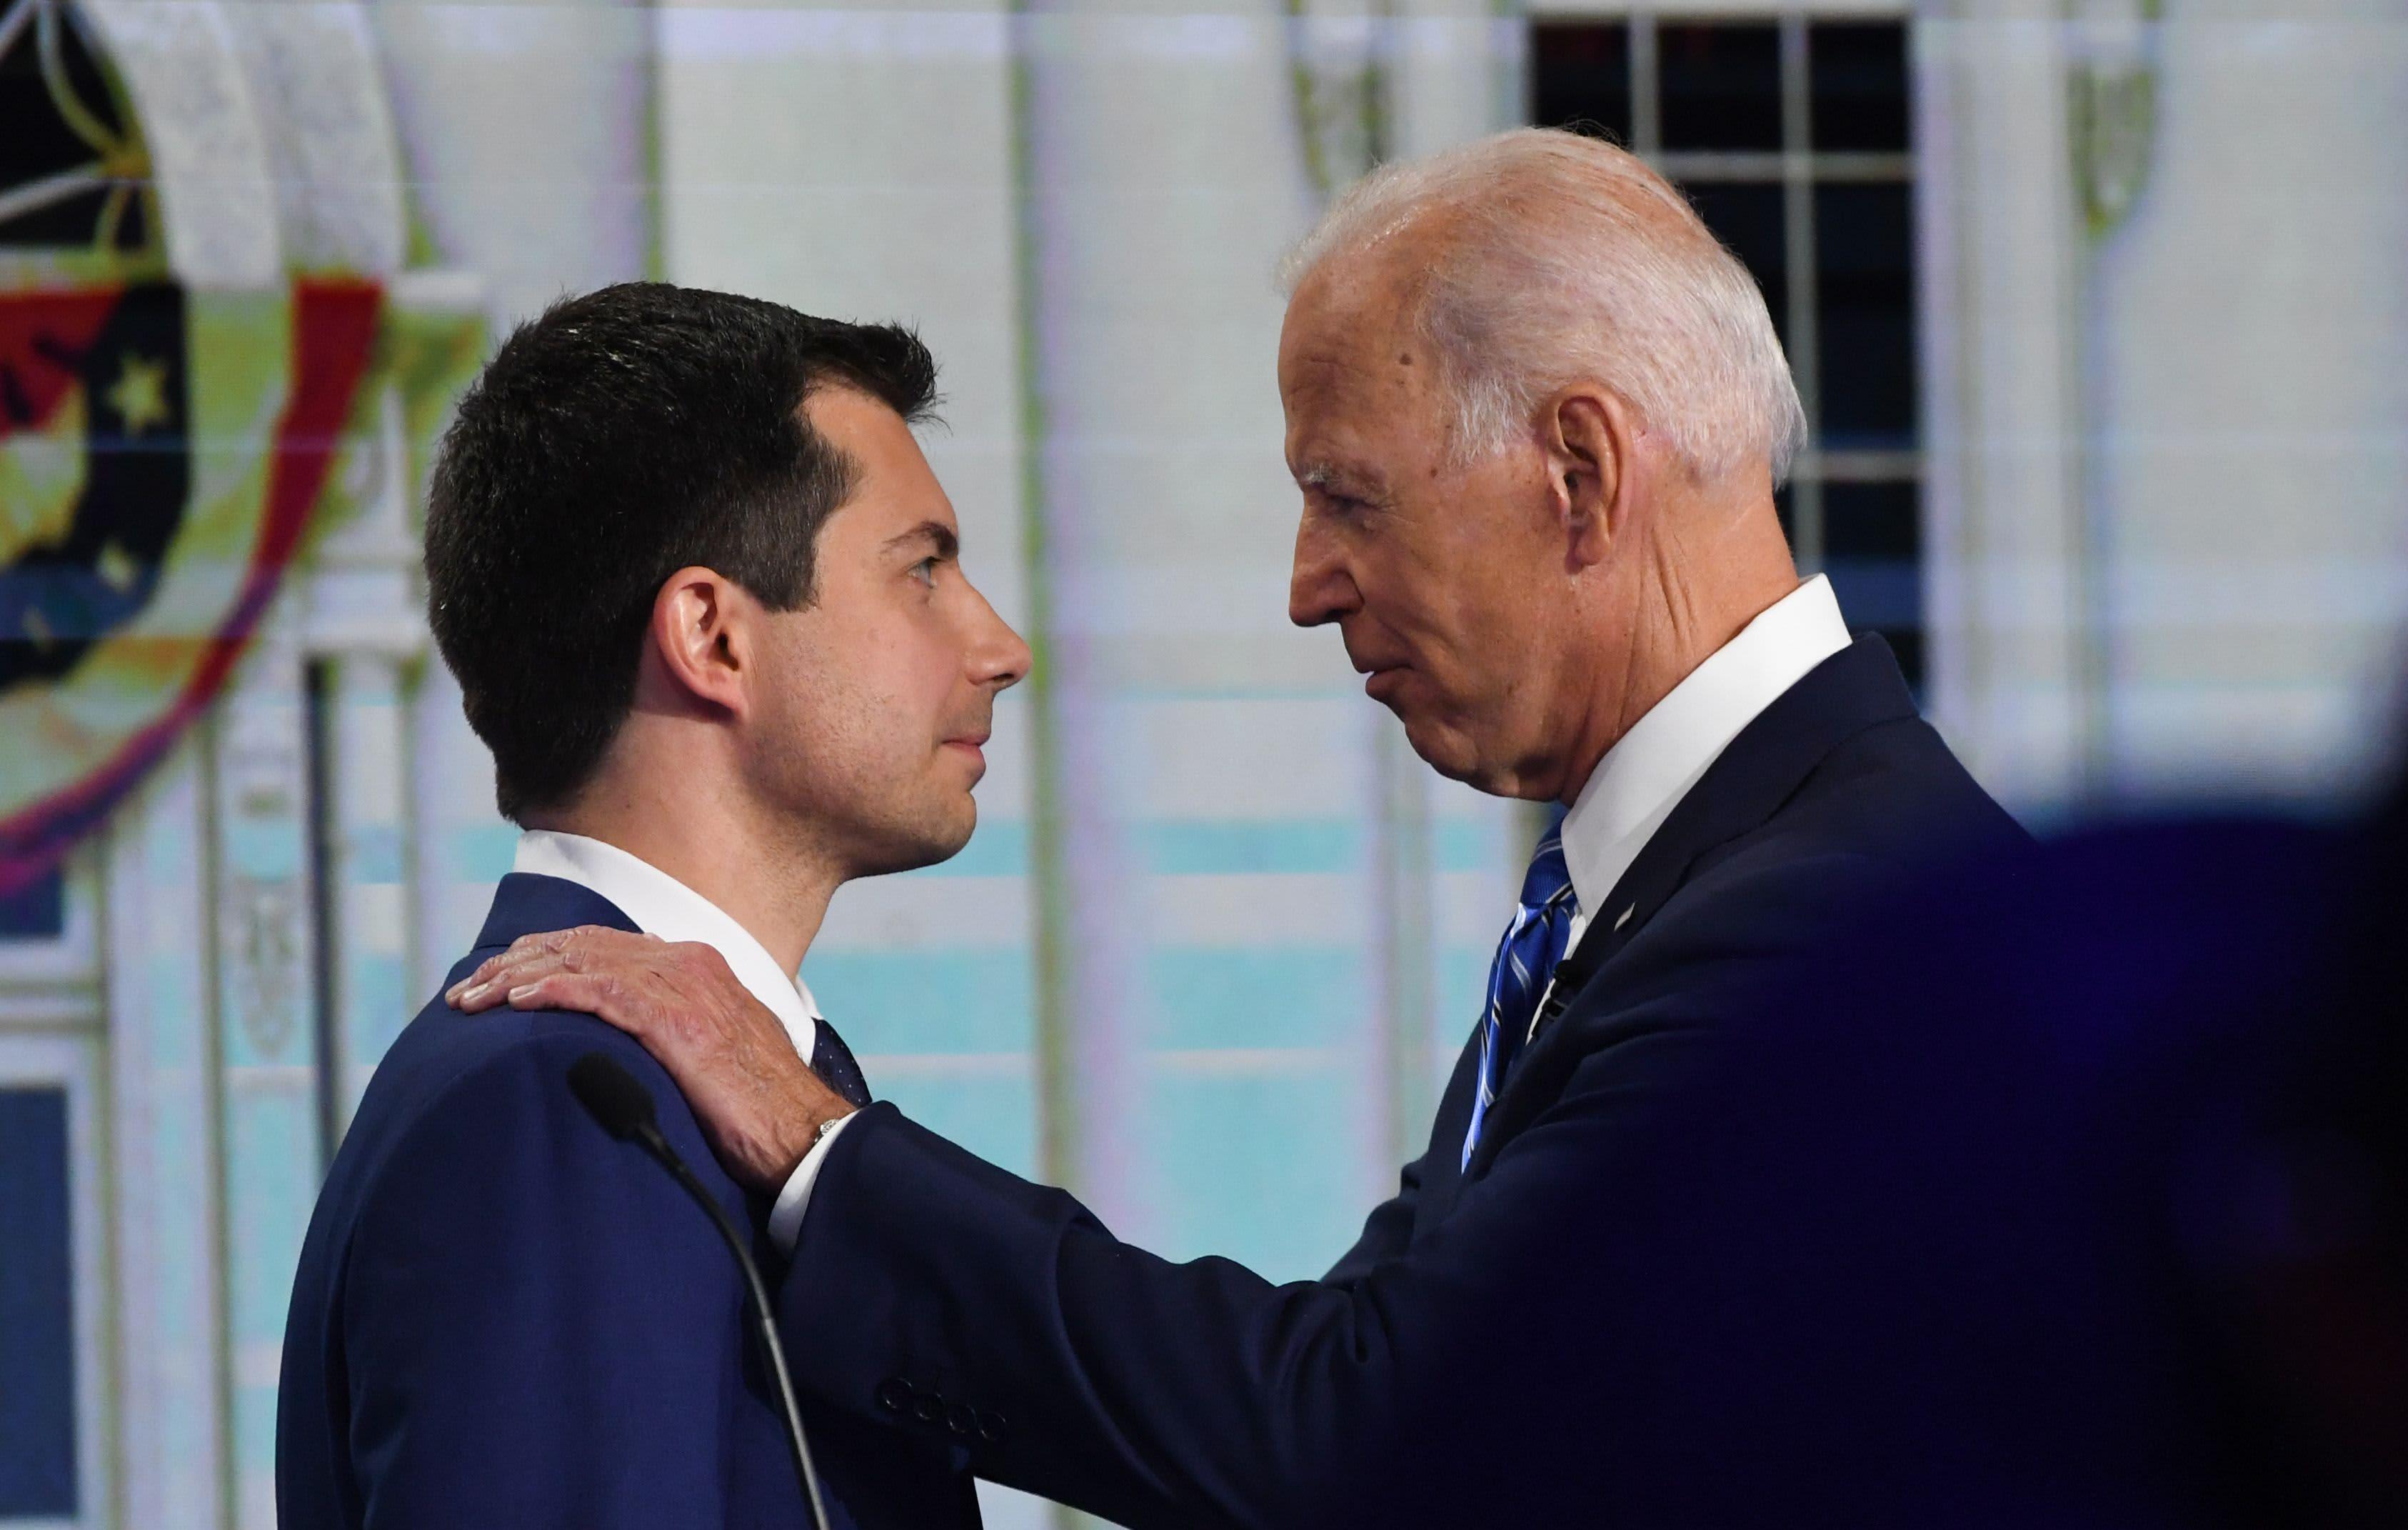 Buttigieg jabs at Biden's Ukraine work, says focus is Trump impeachment